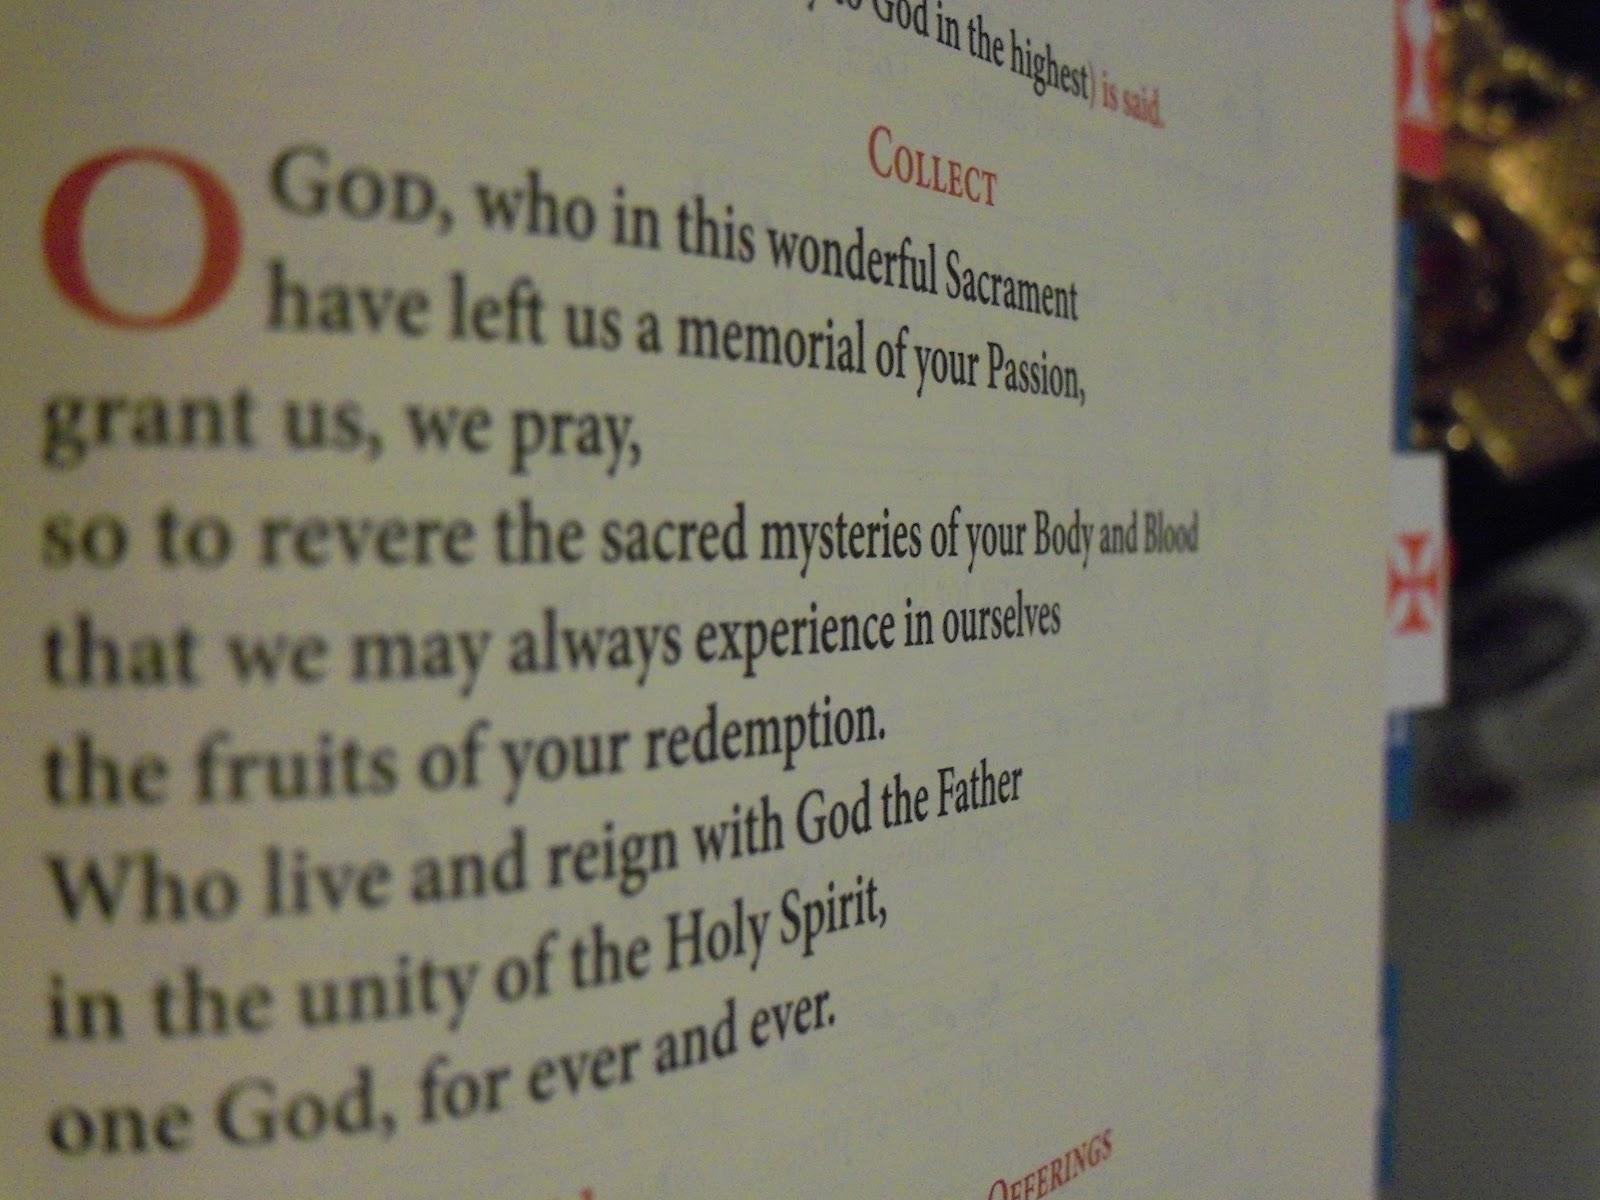 oration piece about unity